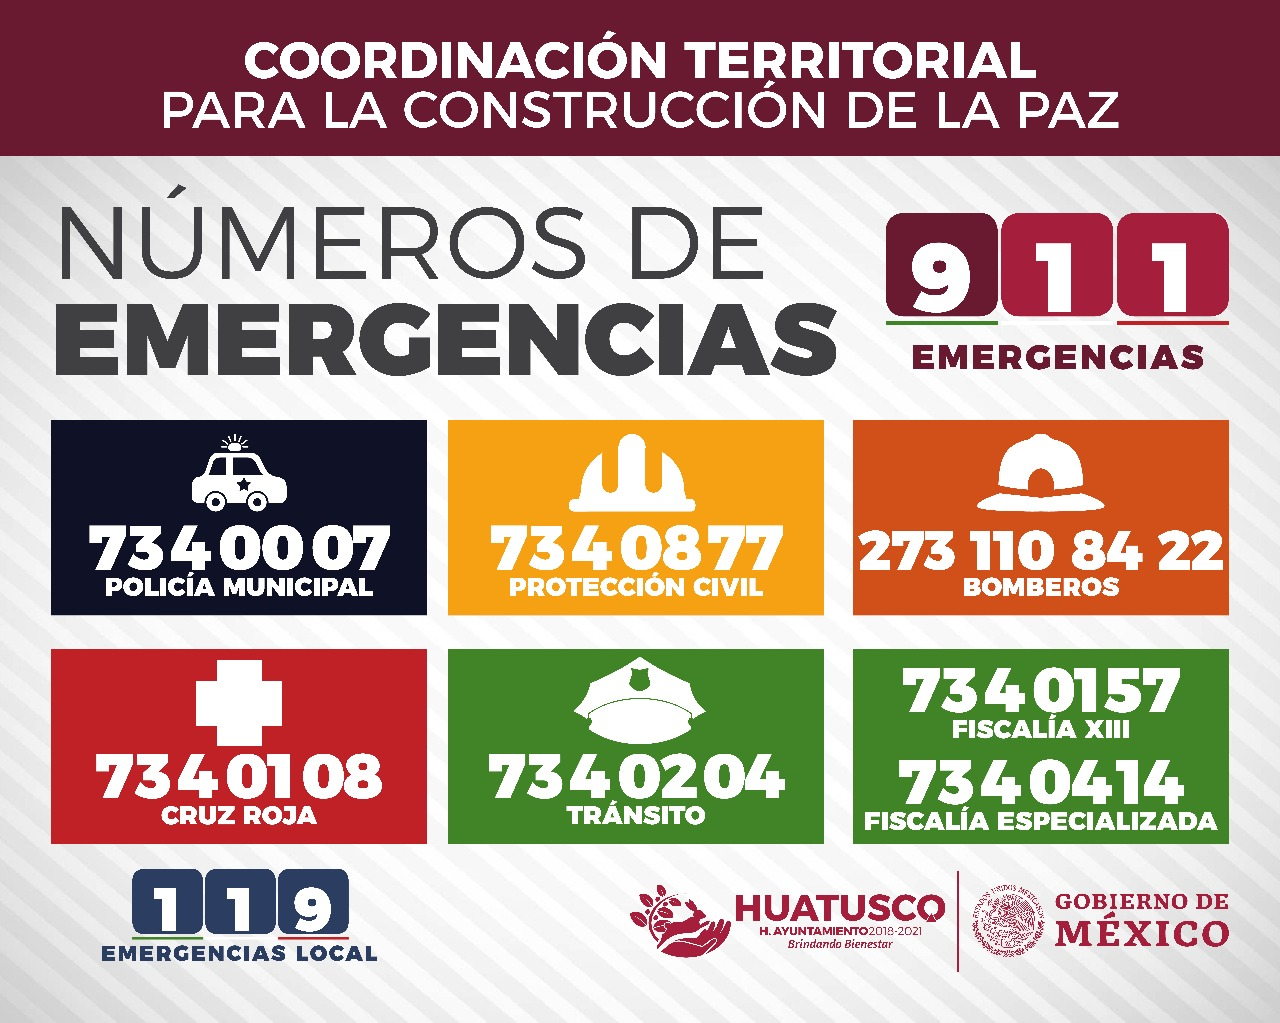 Numeros de Emergencia Huatusco